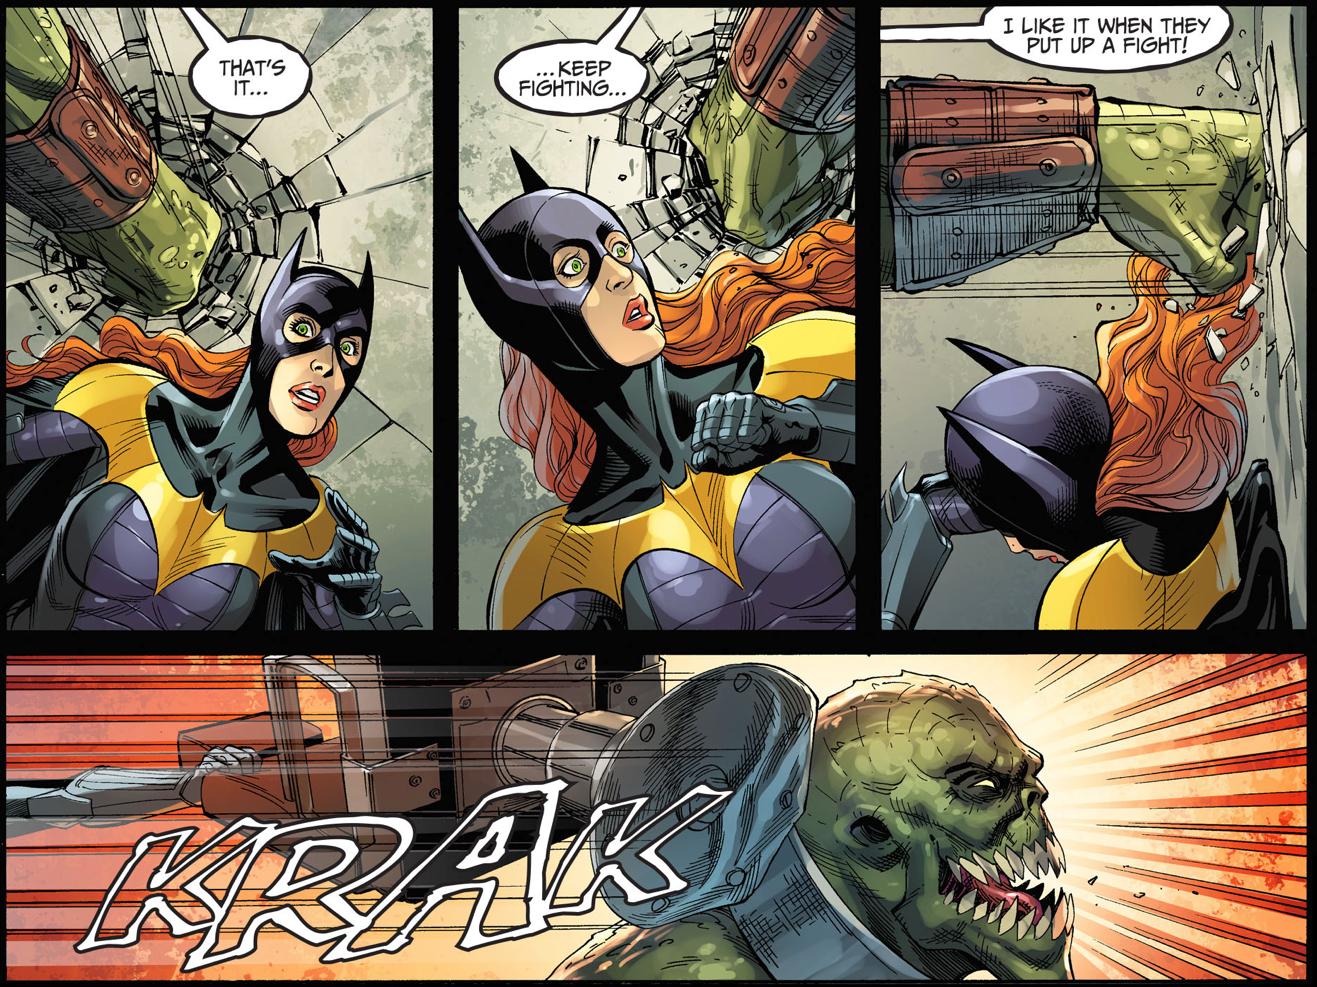 batgirl and catwoman vs killer croc (injustice gods among us)